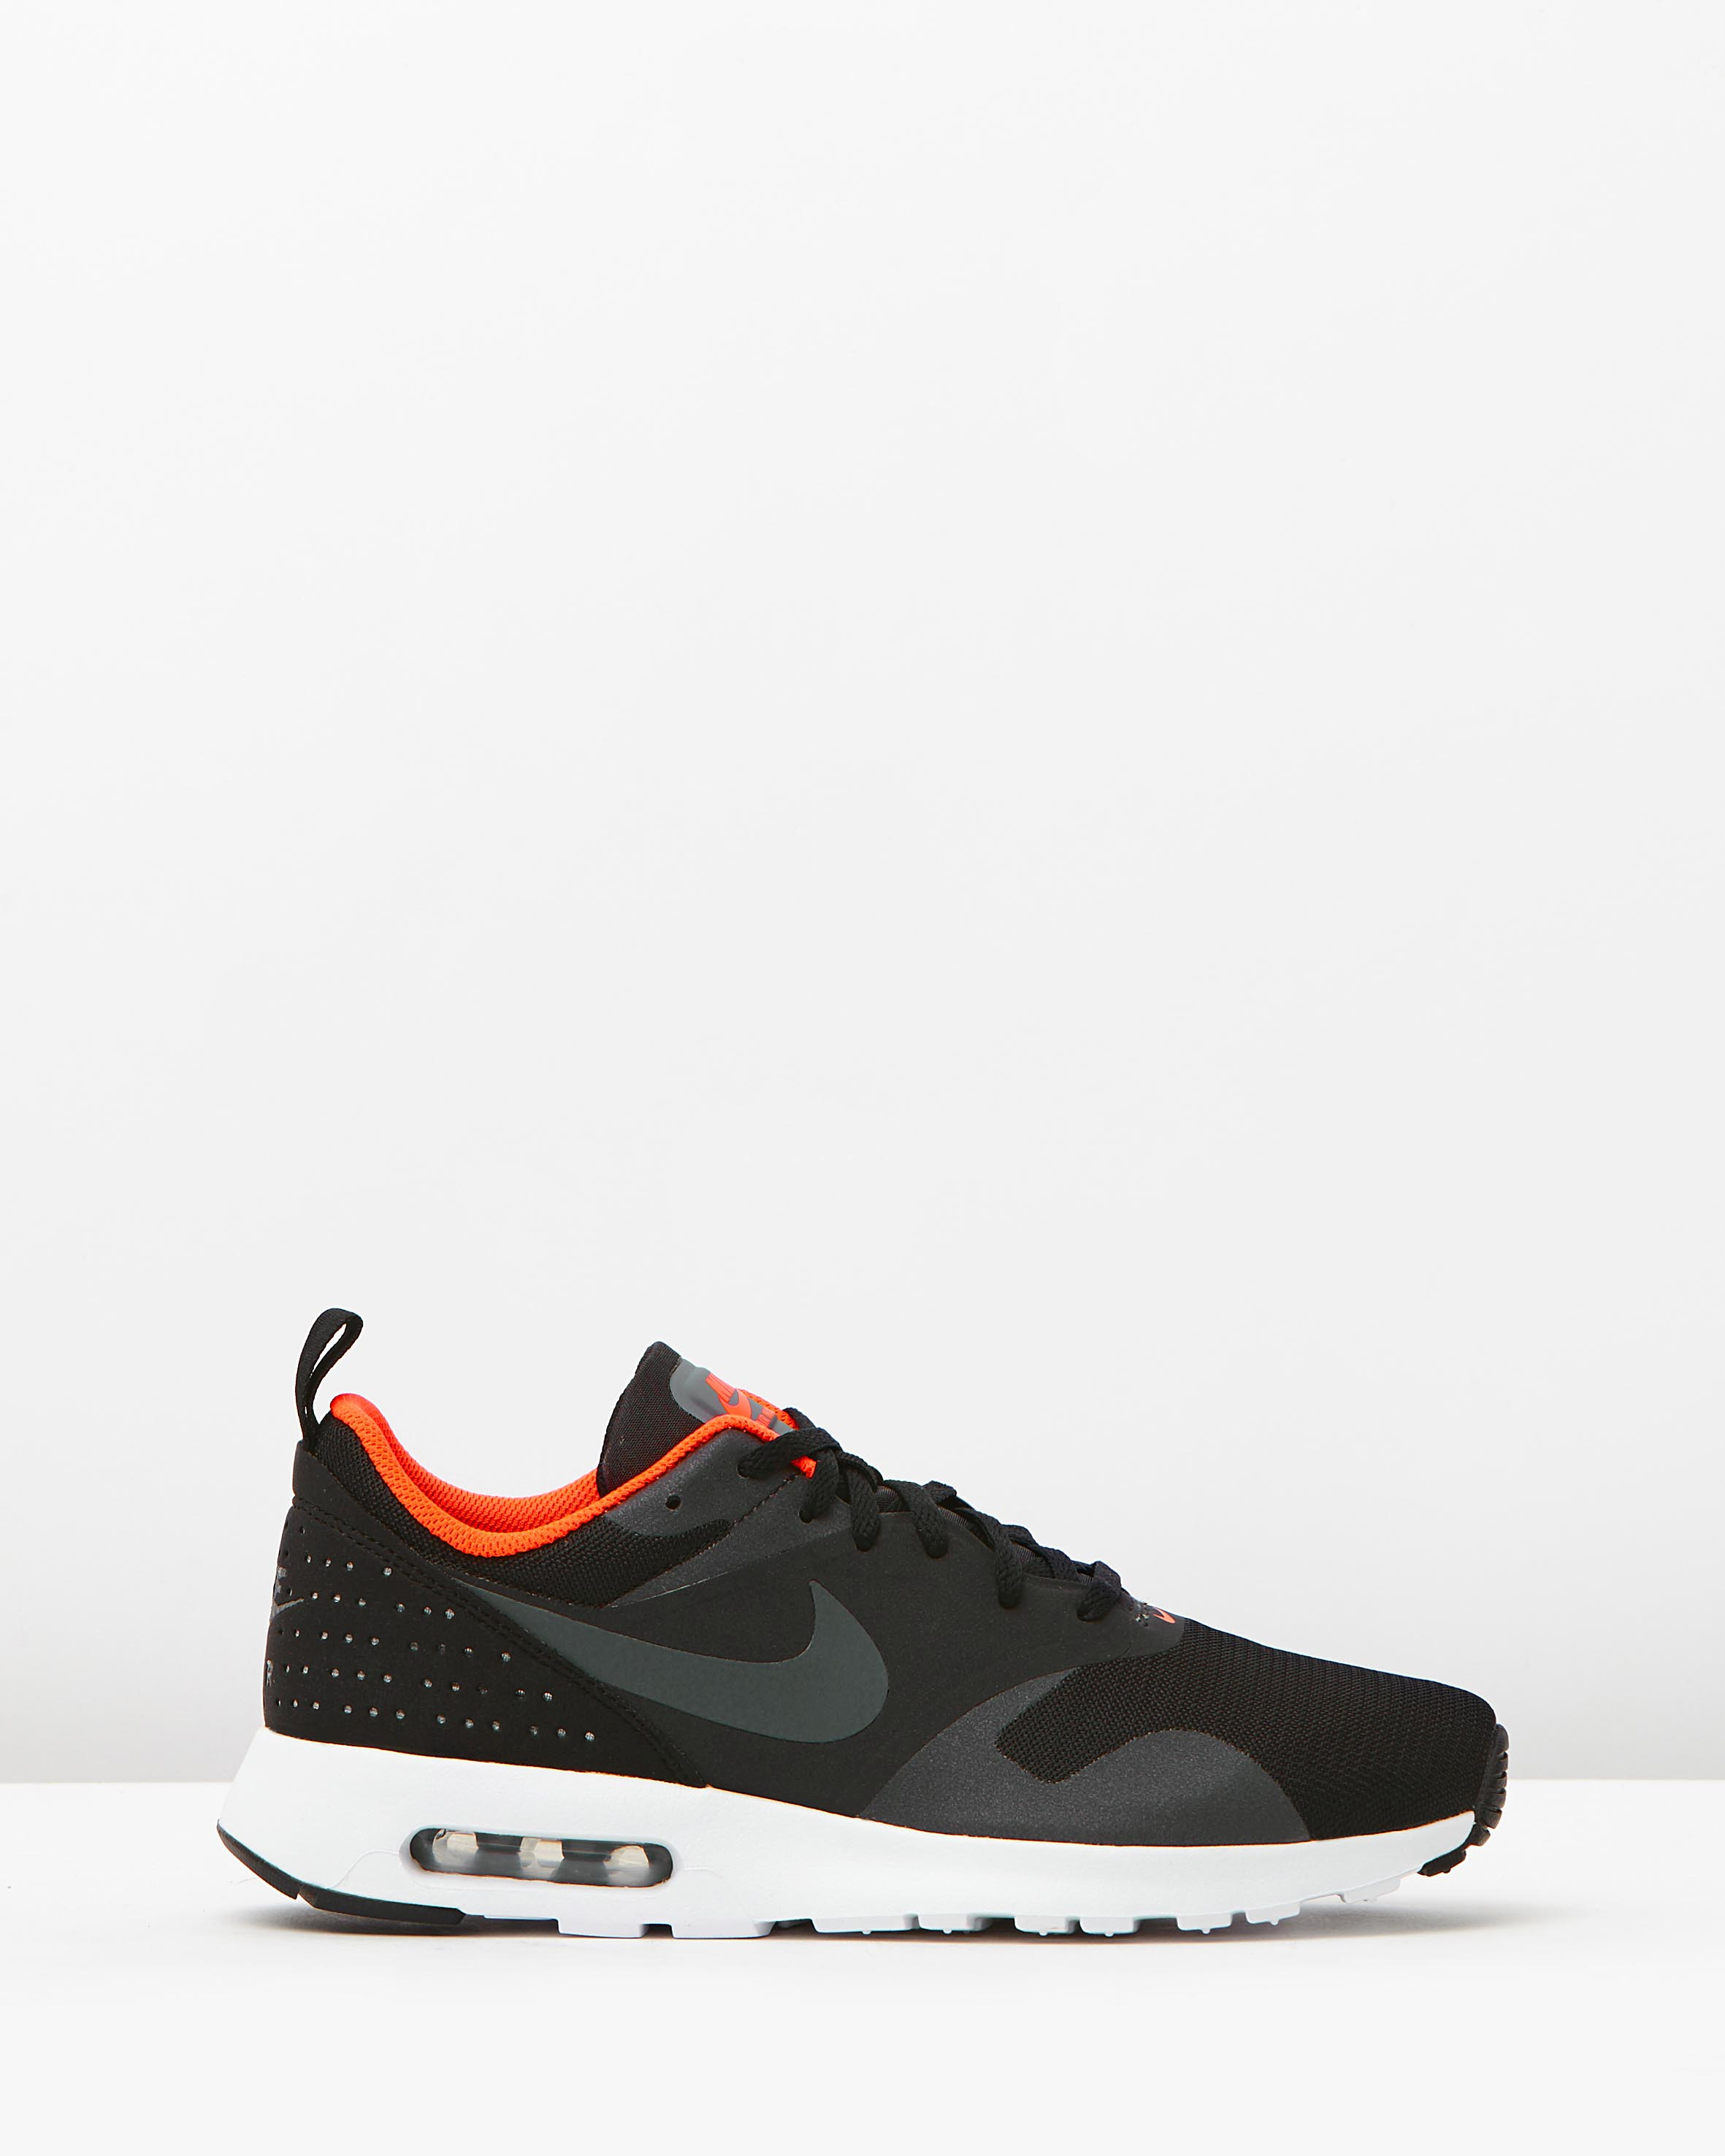 nike men s air max tavas black dark grey sneaker store. Black Bedroom Furniture Sets. Home Design Ideas